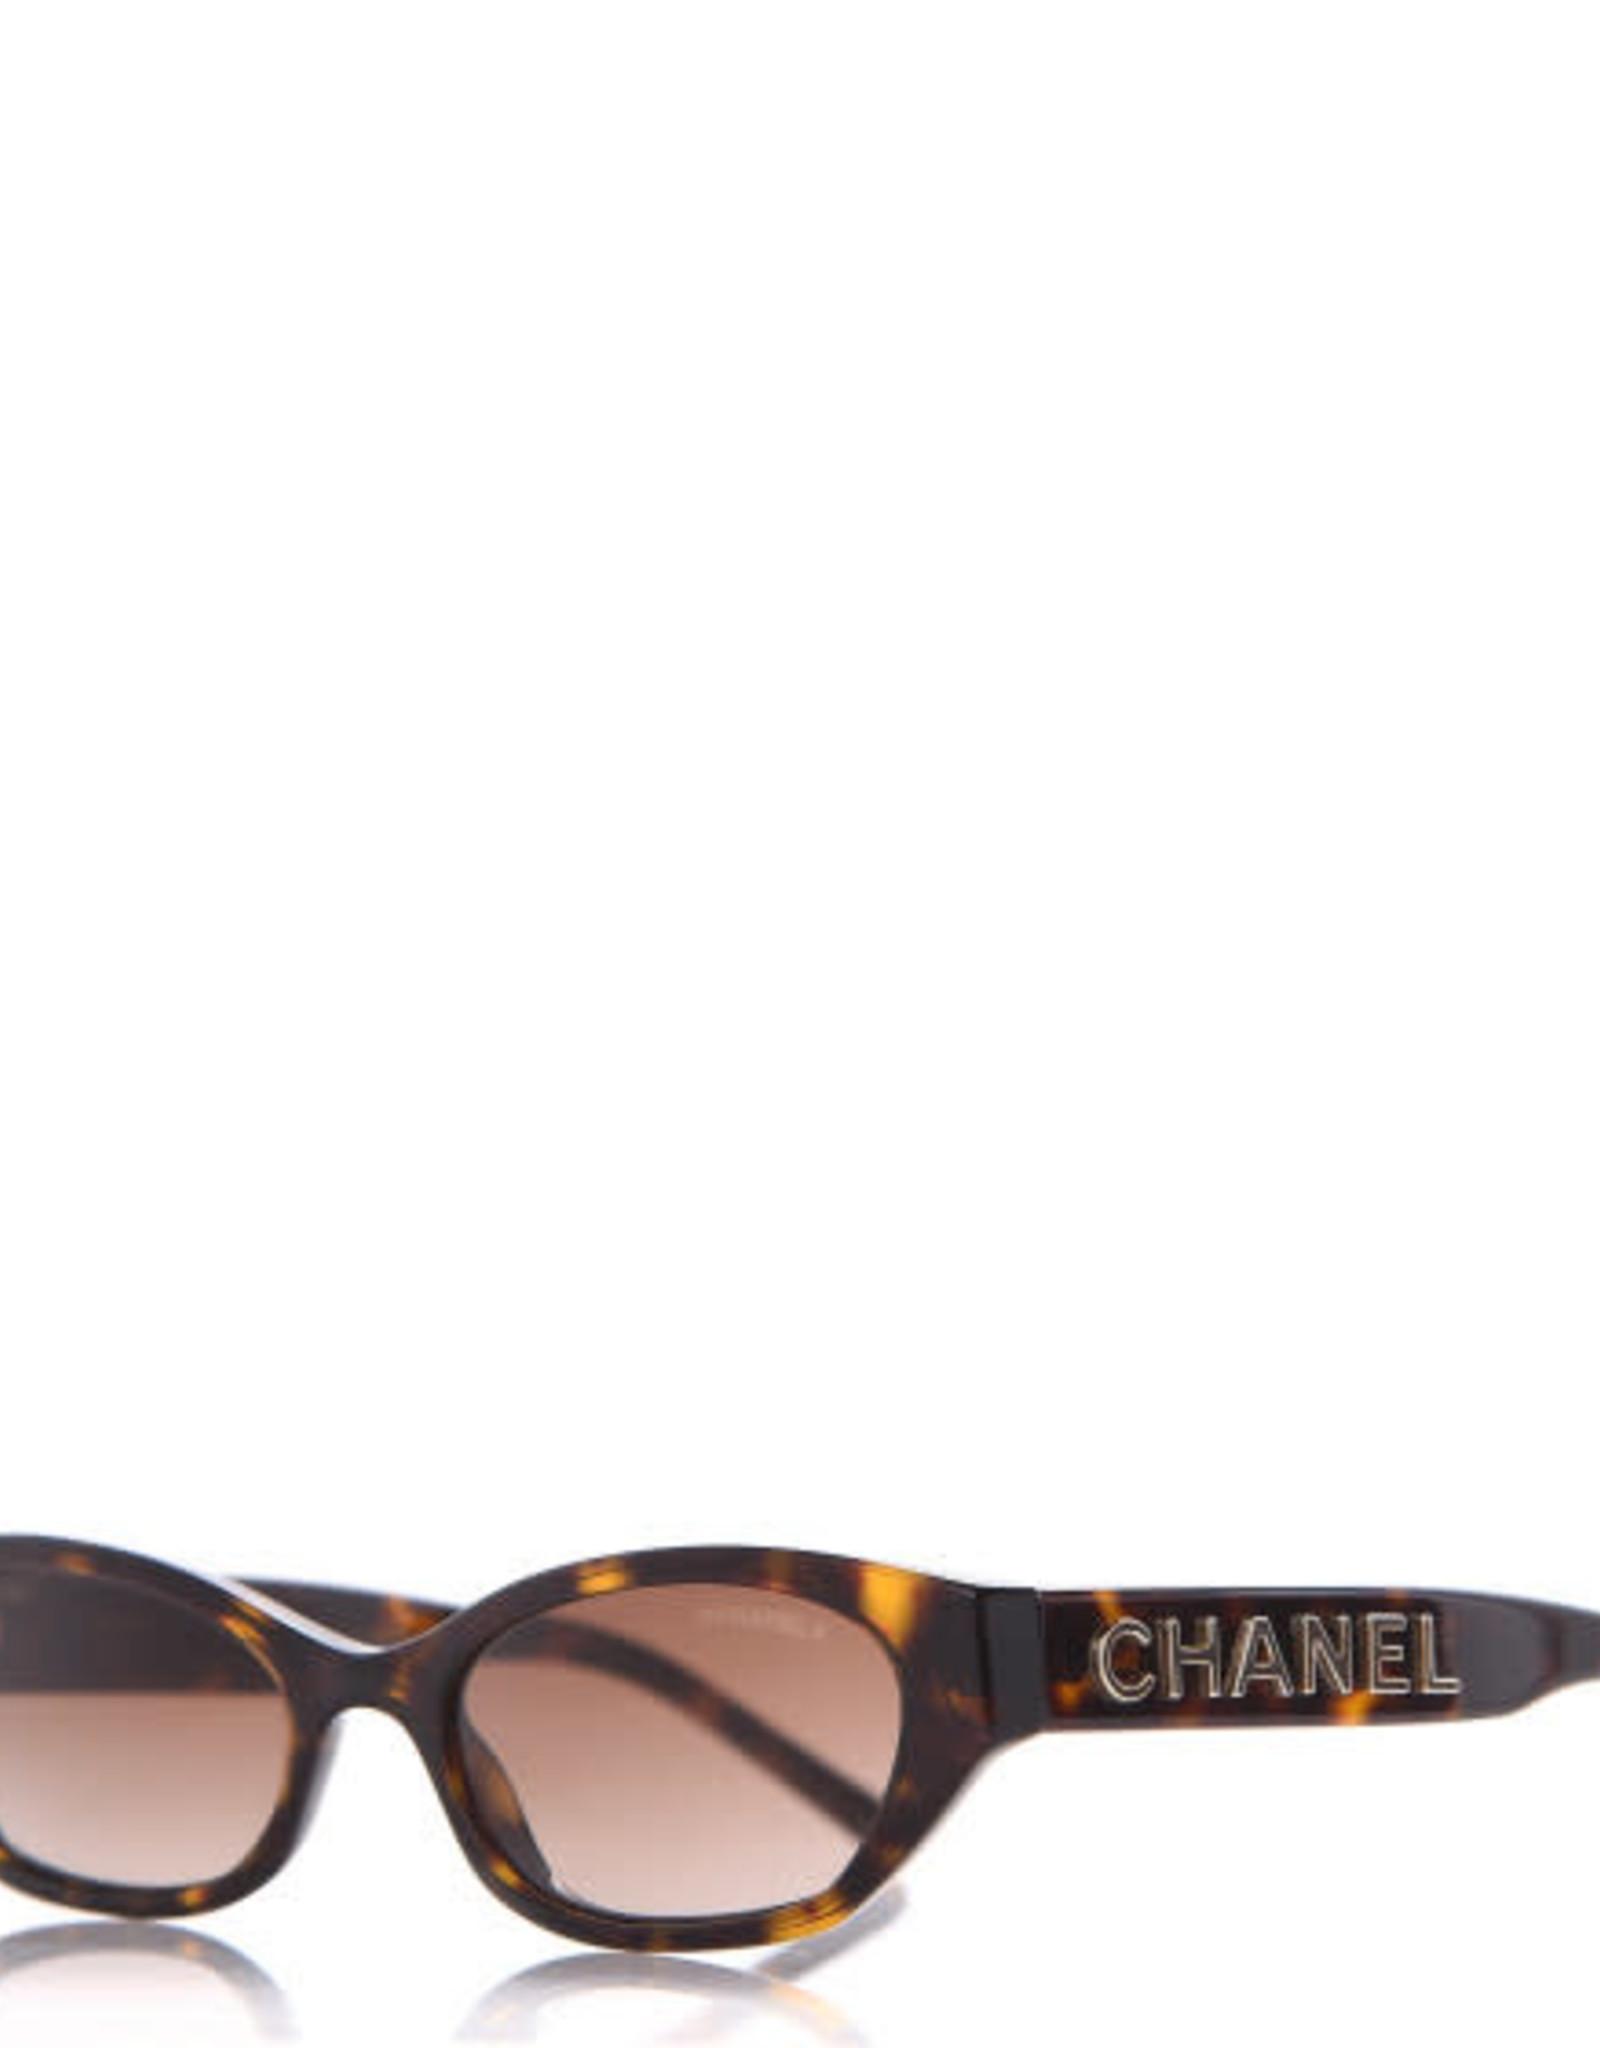 Chanel Chanel Tortoise Sunglasses